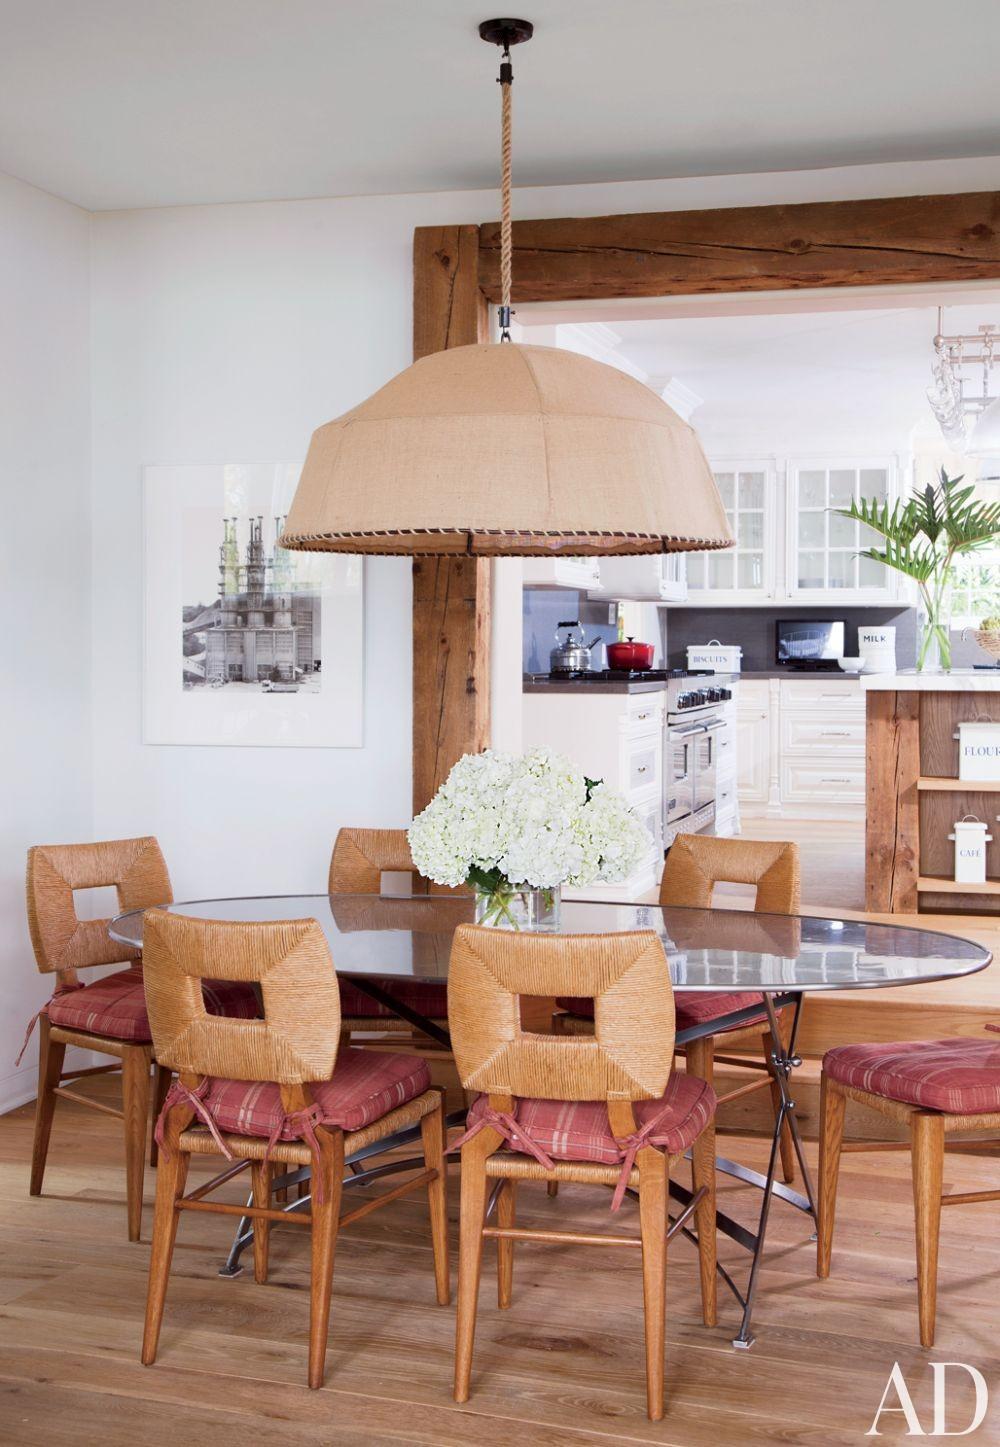 Contemporary Dining Room by Trip Haenisch & Associates in Bel Air, California